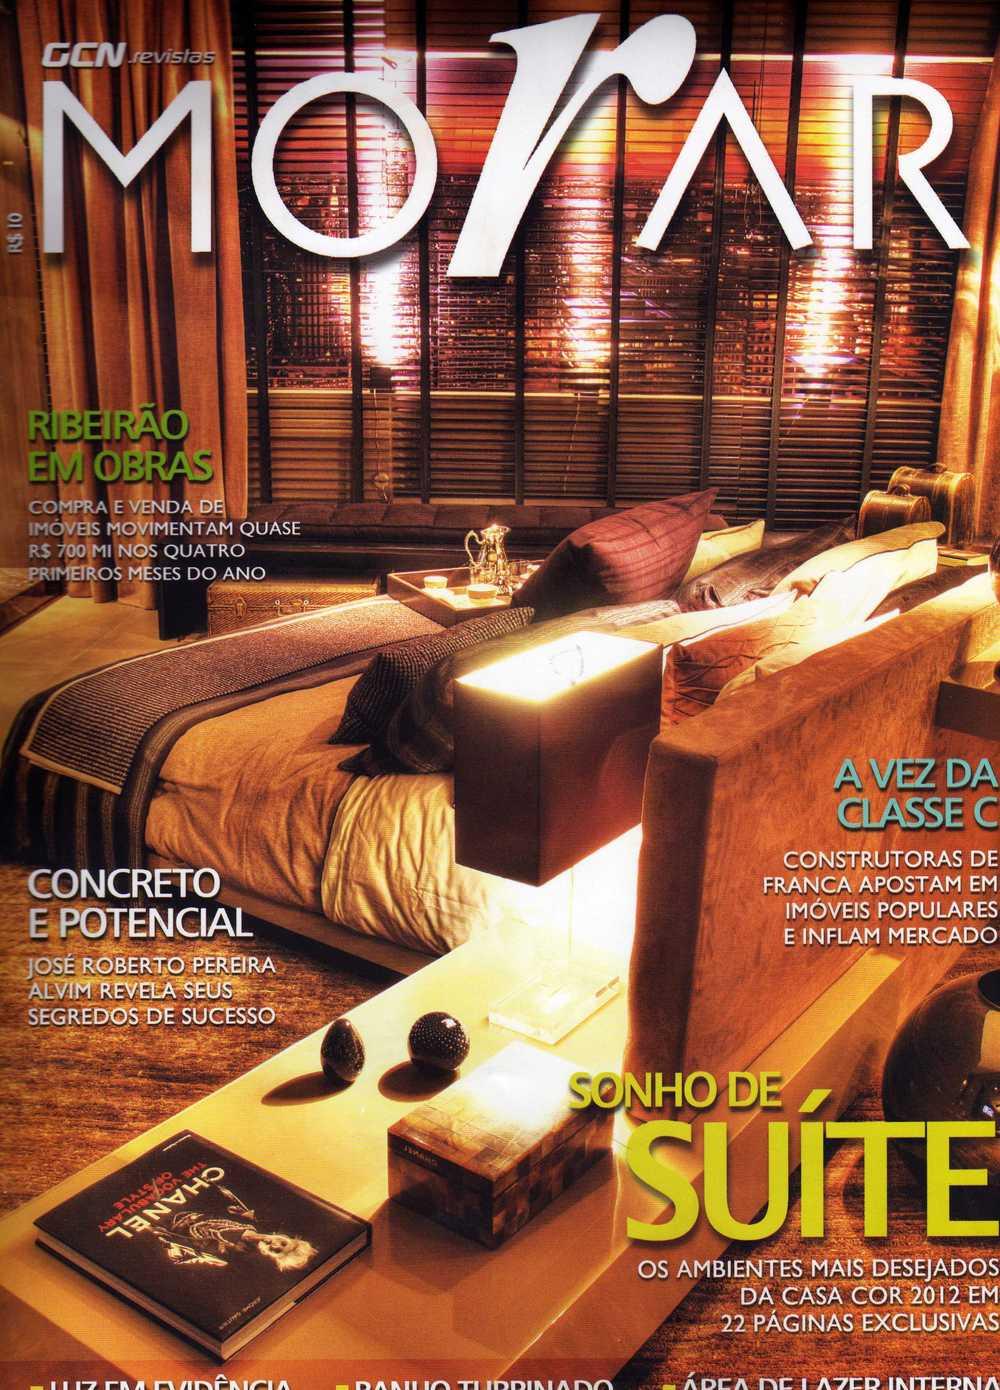 Revista Morar - GCN